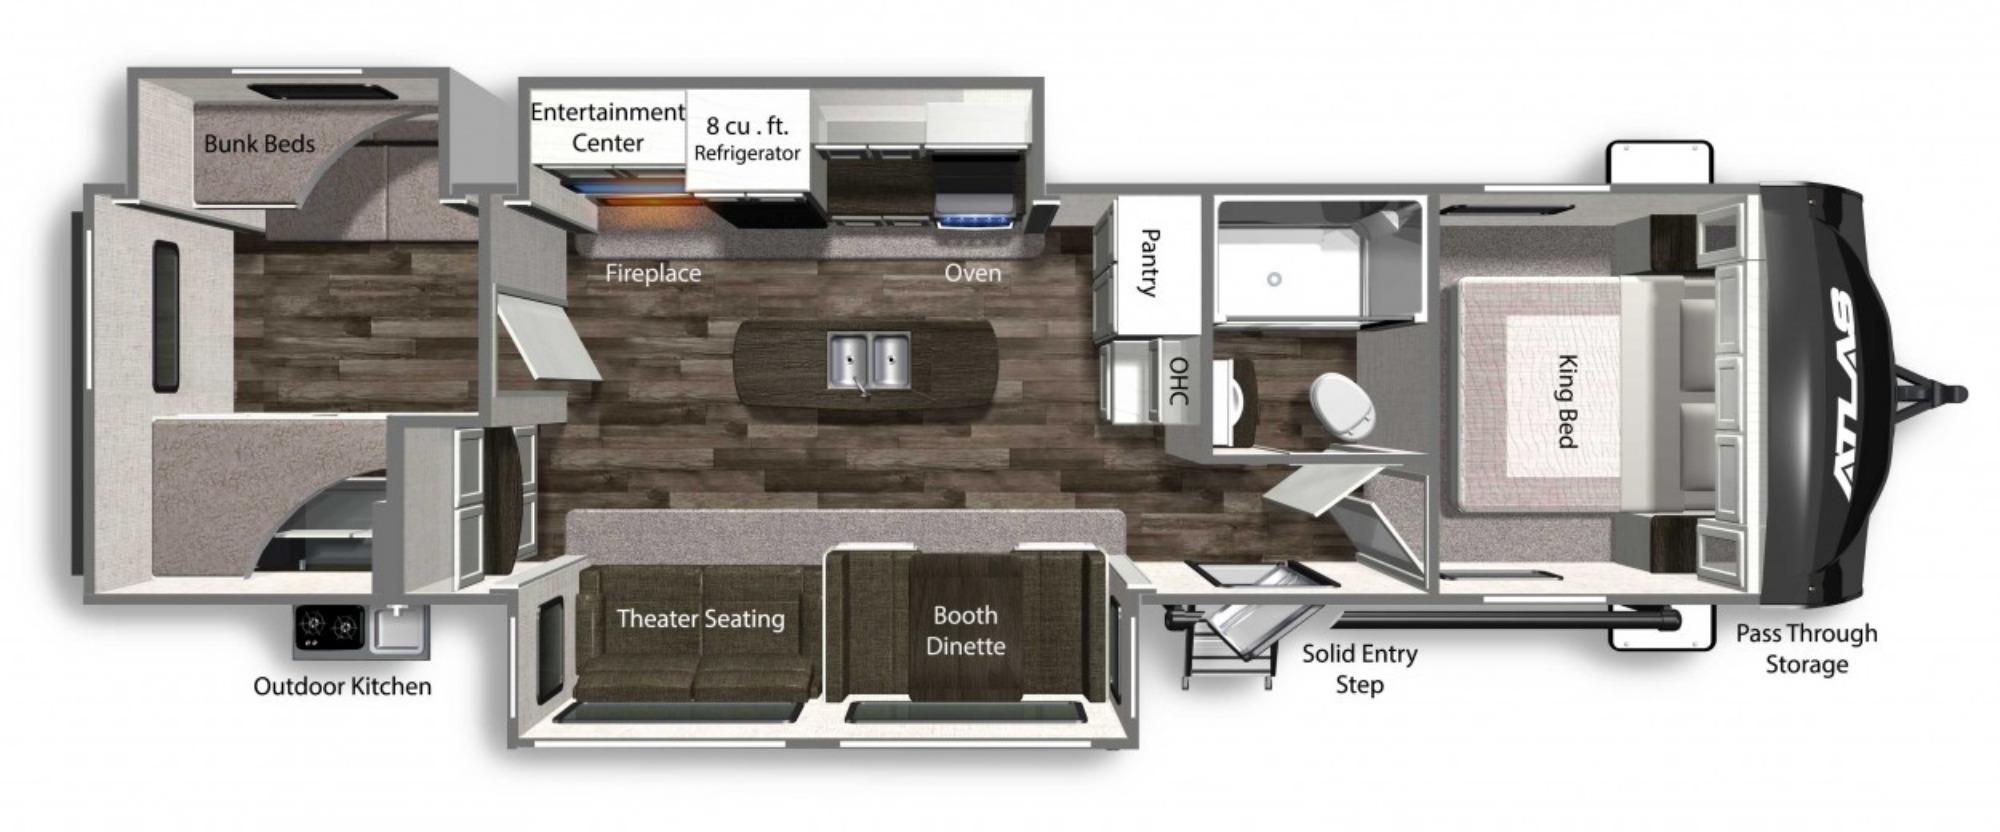 View Floor Plan for 2022 DUTCHMEN ATLAS 3382BH